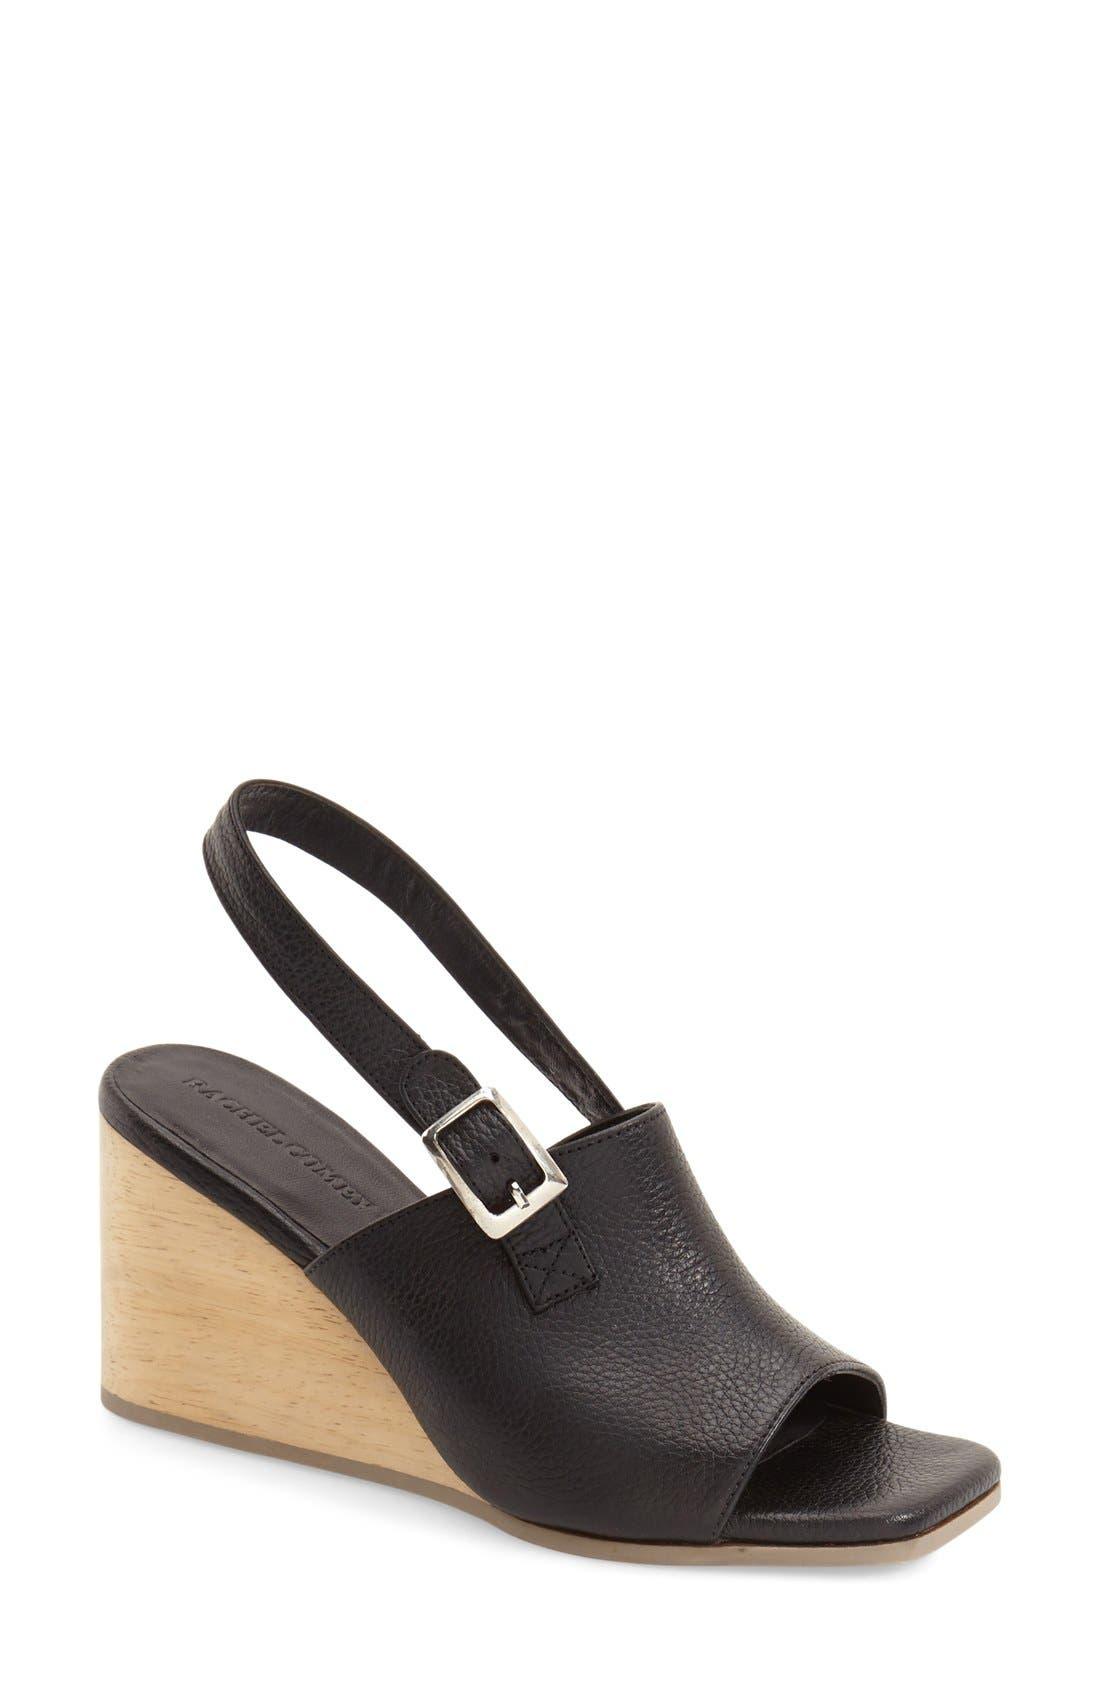 Main Image - Rachel Comey 'Vista' Wedge Sandal (Women)